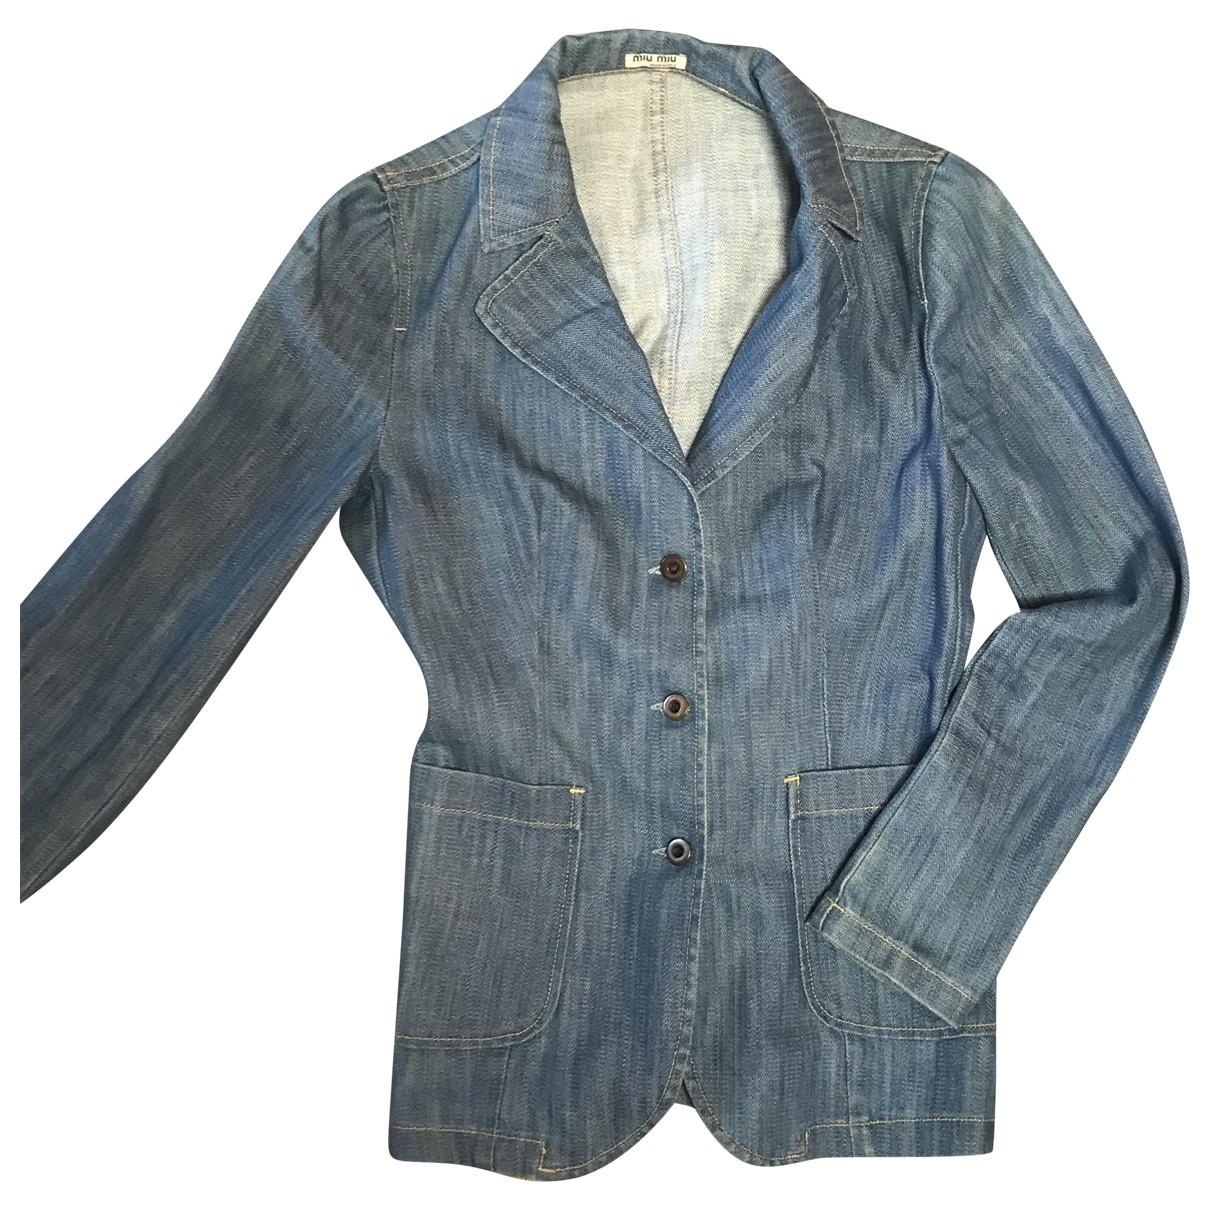 Miu Miu \N Blue Cotton jacket for Women 36 FR